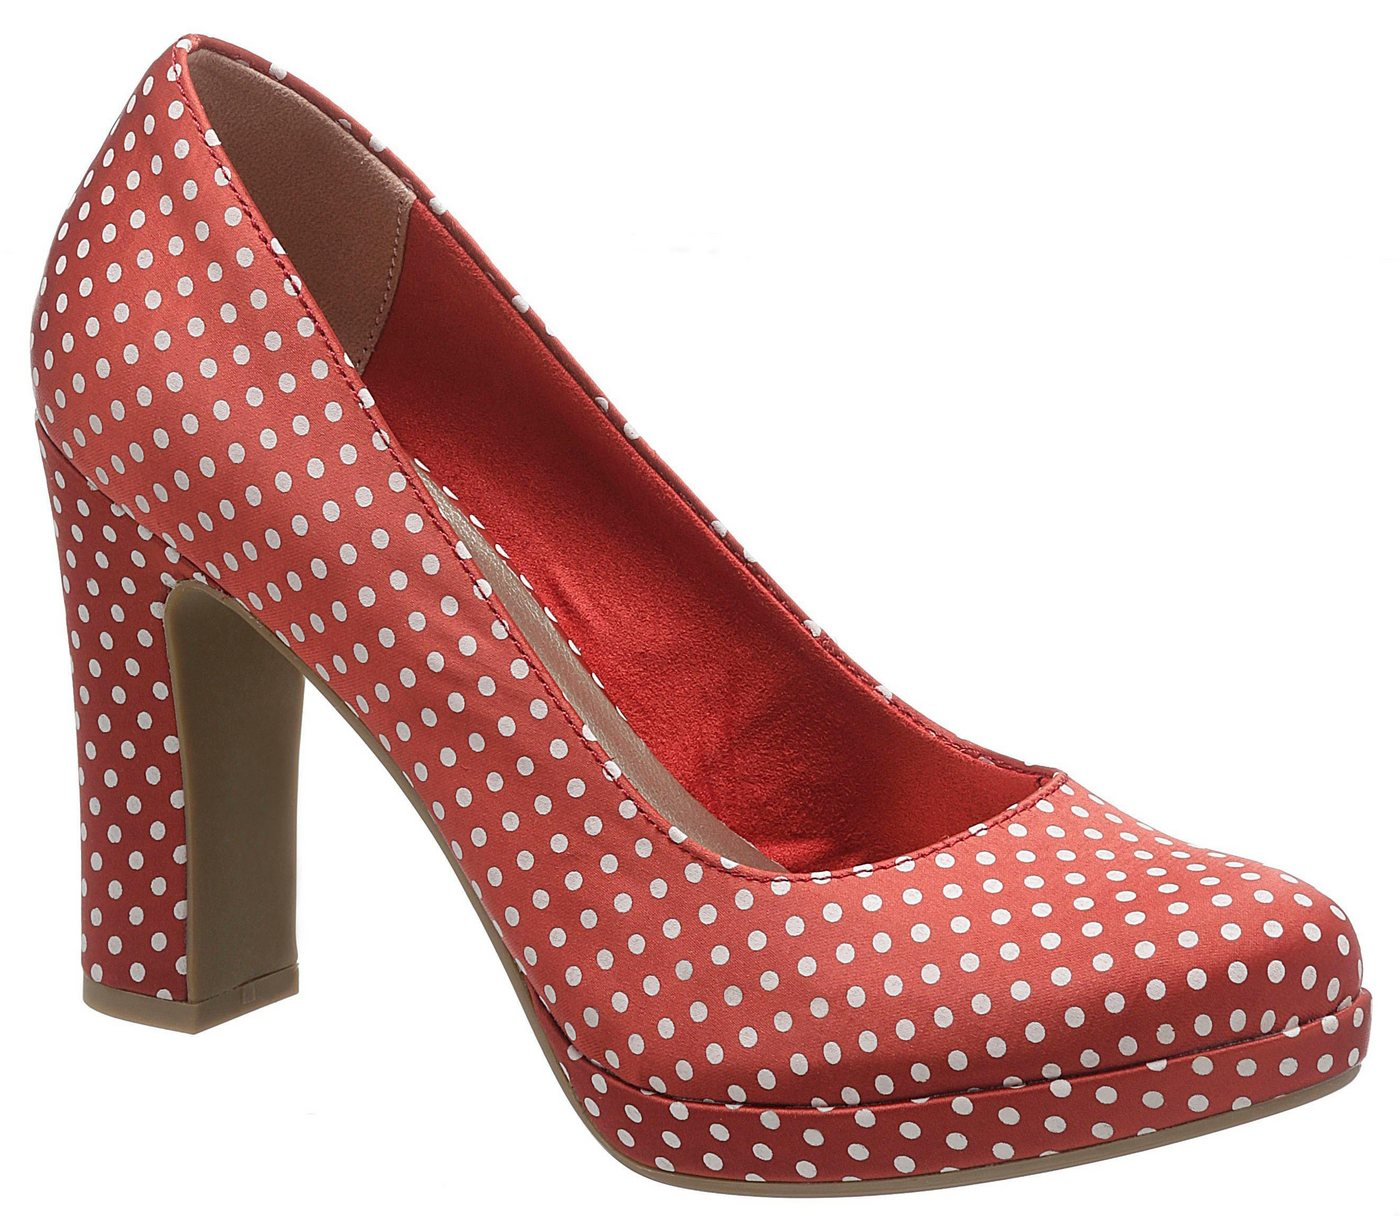 Tamaris »Lycoris« High-Heel-Pumps mit hübschen Pünktchen-Print | Schuhe > High Heels > High Heel Pumps | Rot | Tamaris